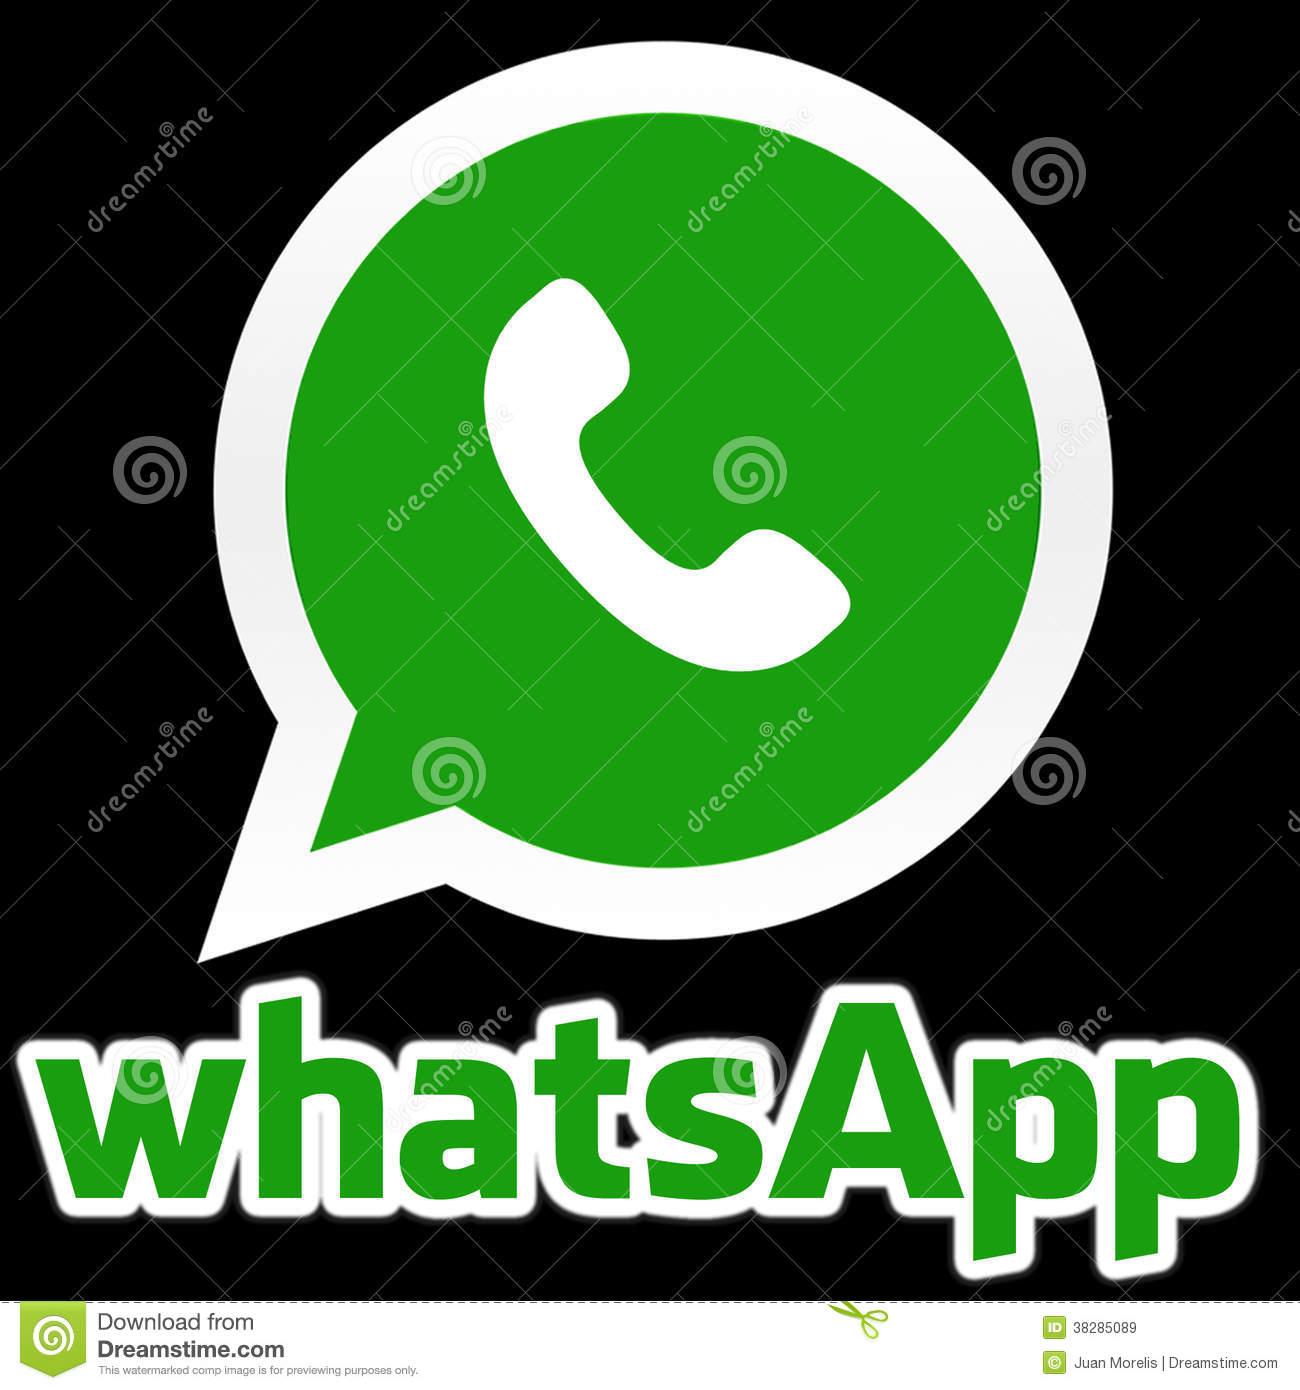 ek phone mei do whatsapp kaise chalaye